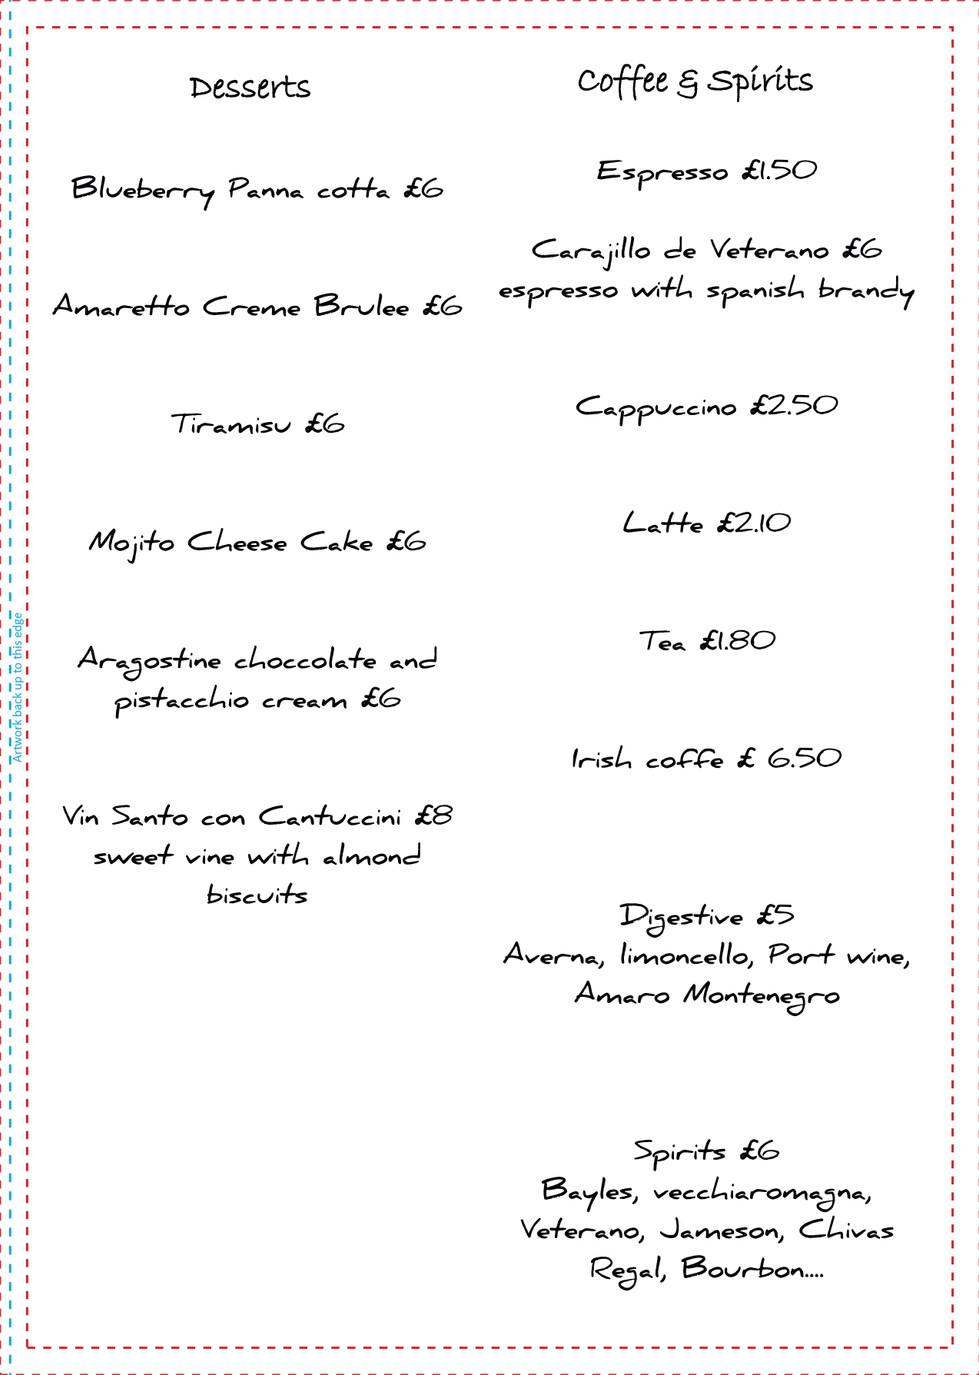 dessert buono 1_page-0002.jpg